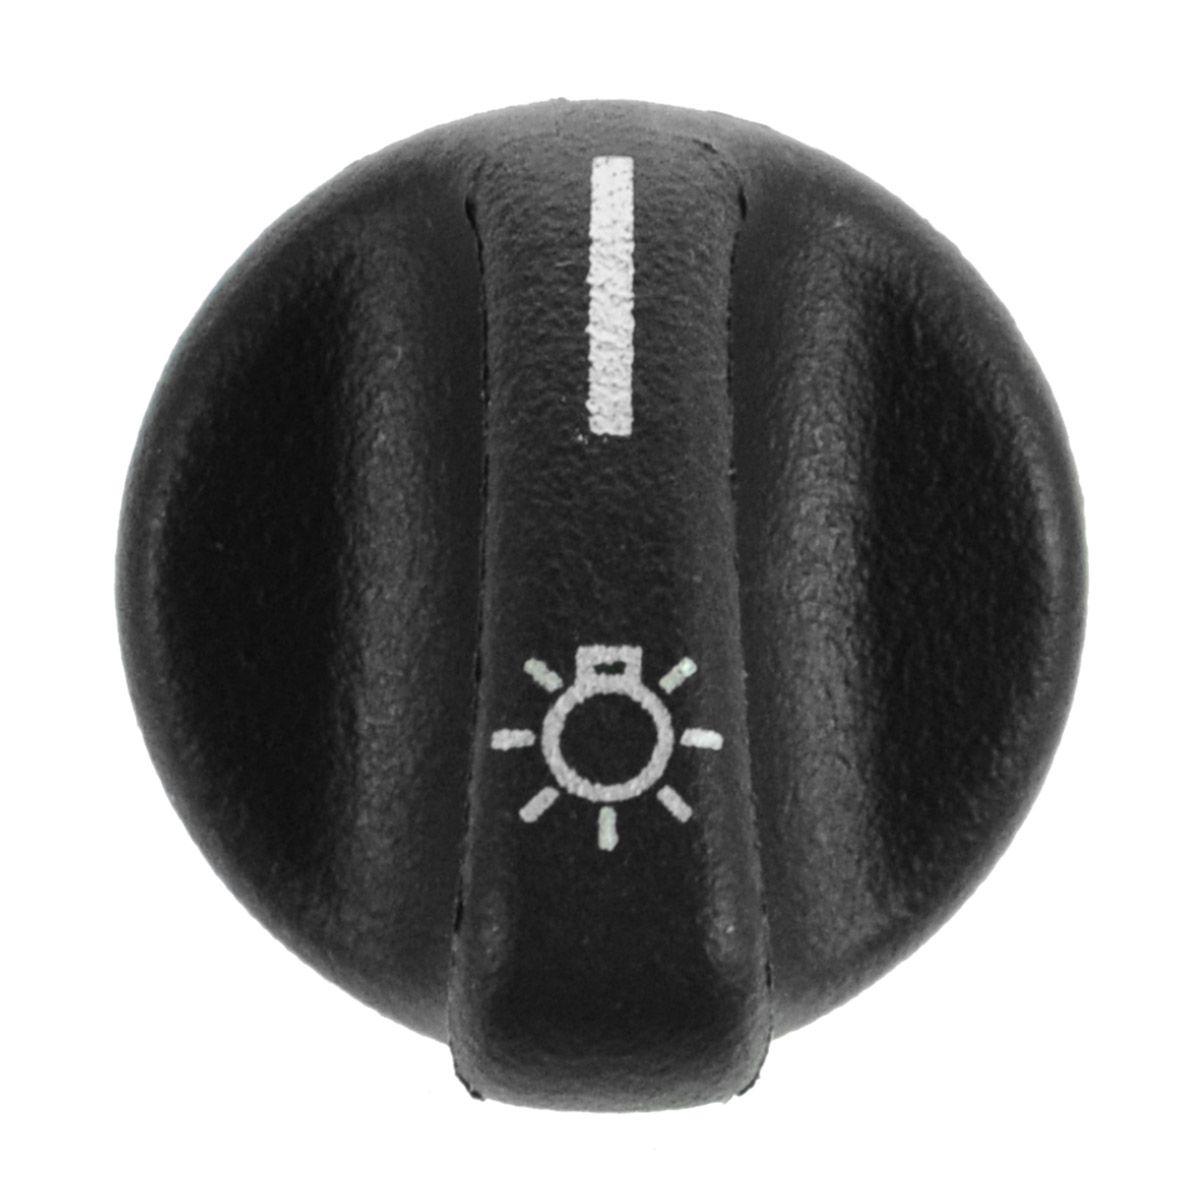 Dorman Headlight Headlamp Knob for ford Mercury New